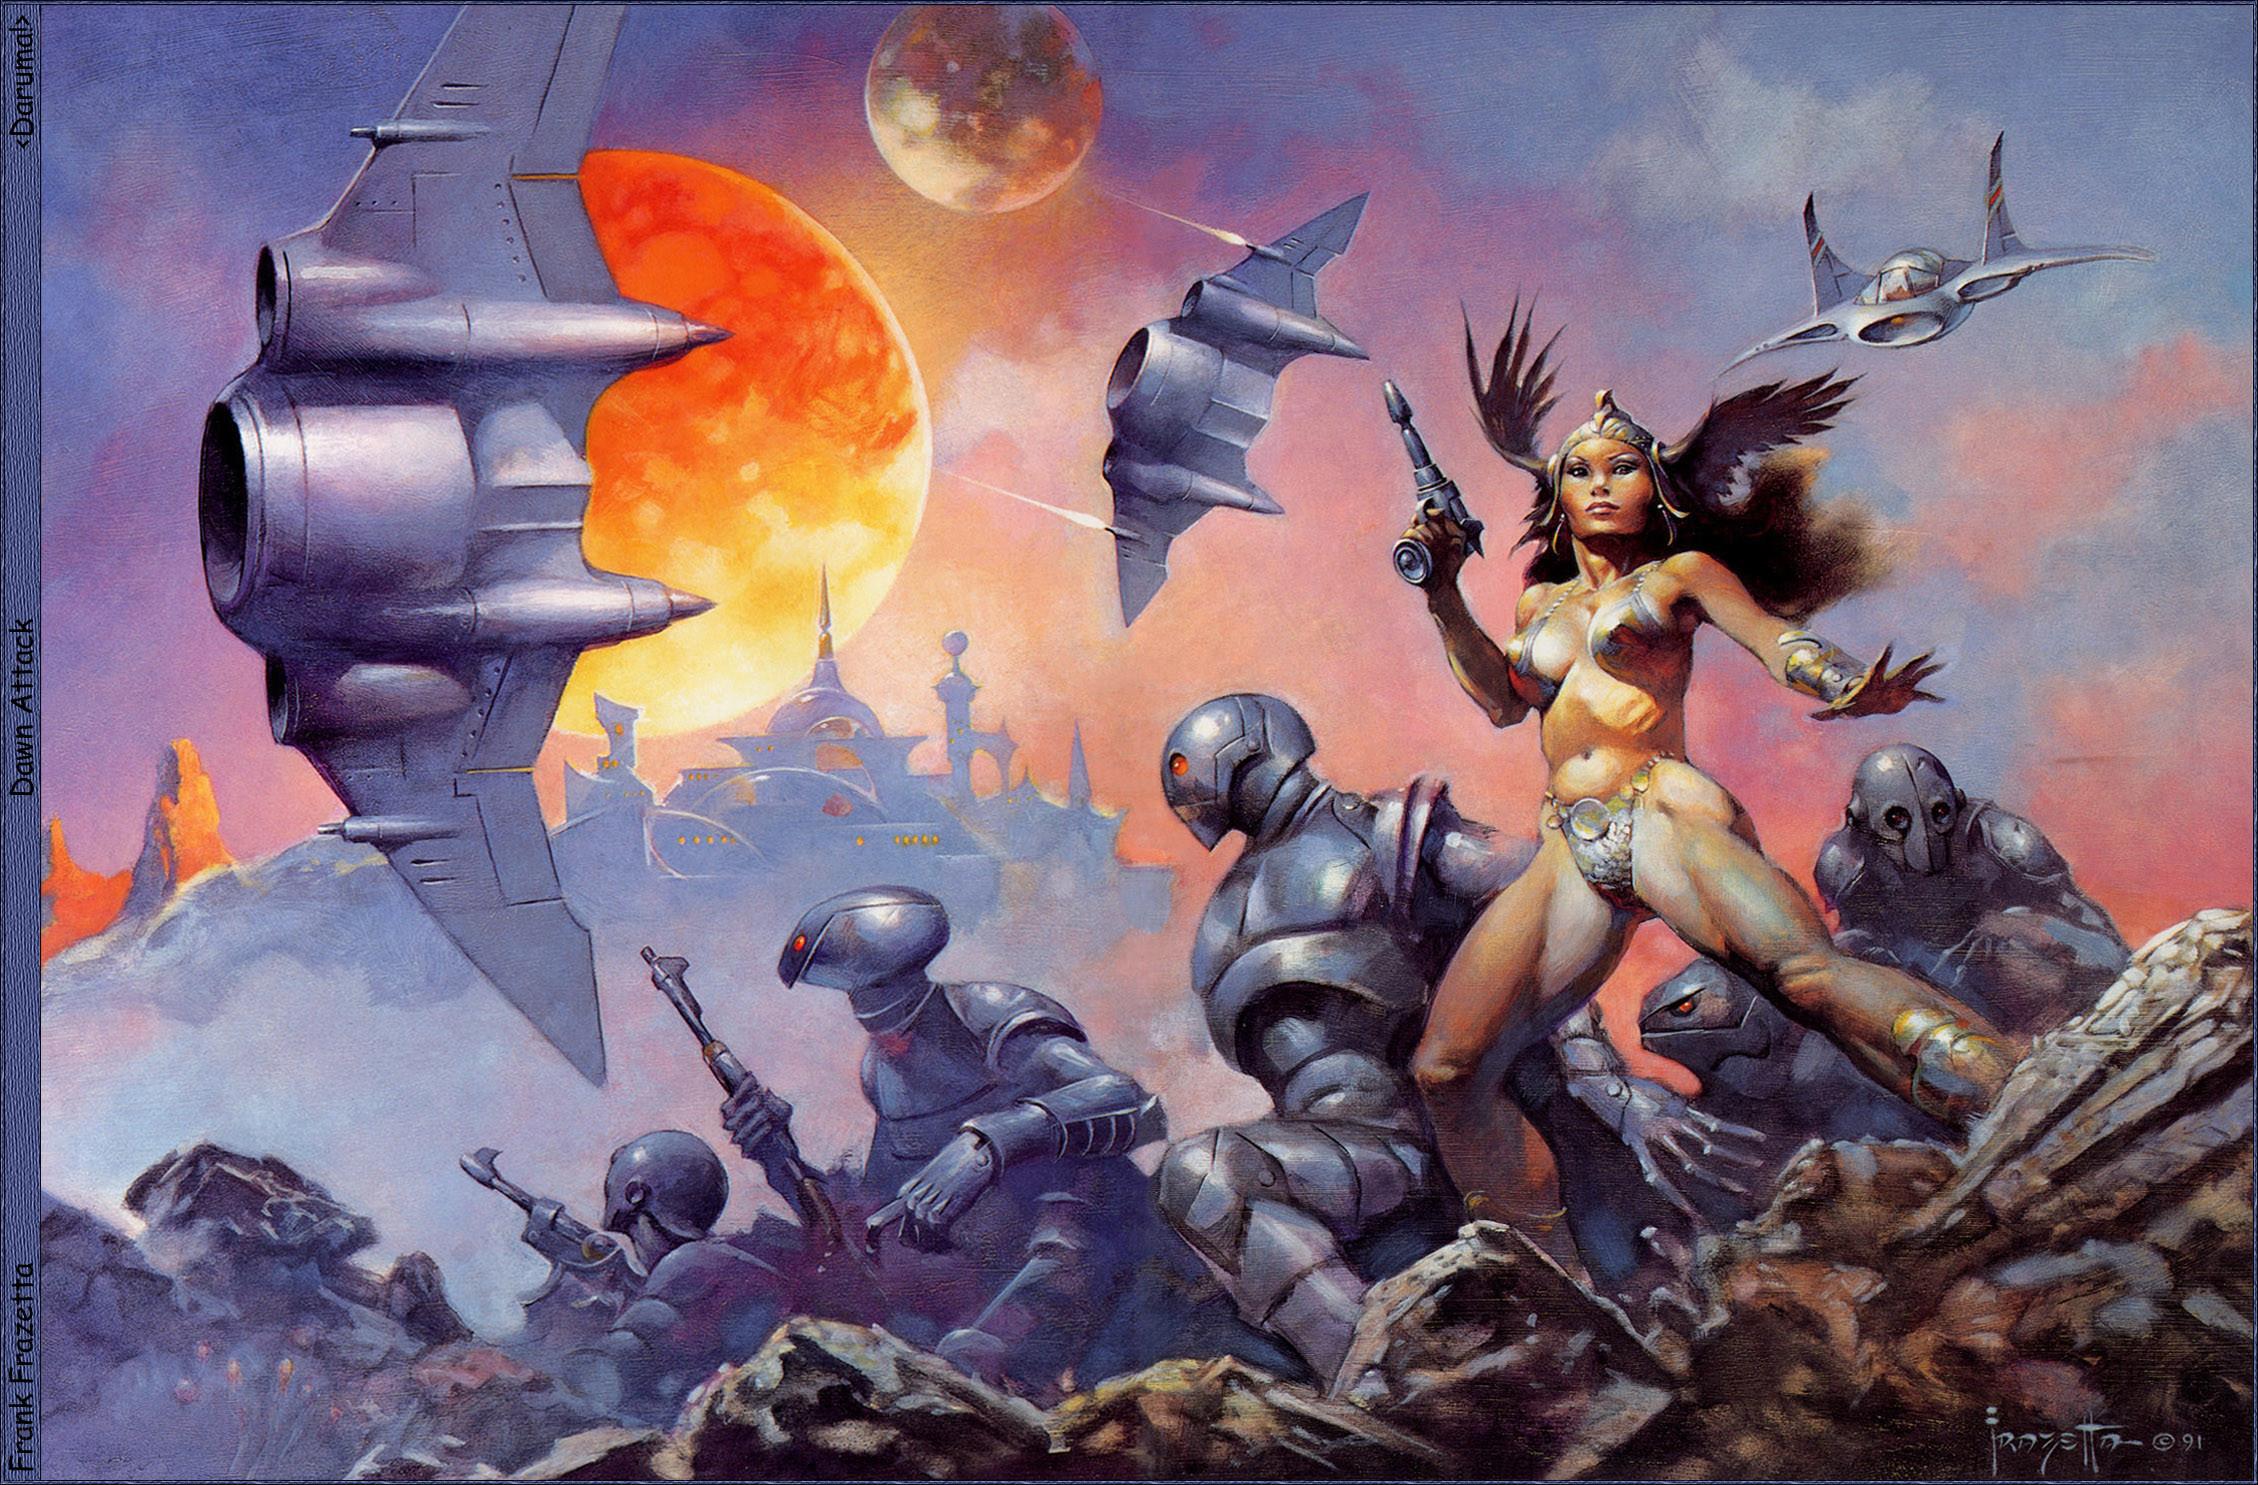 Frank Frazetta Fantasy Widescreen Wallpapers 43 images 2258x1485